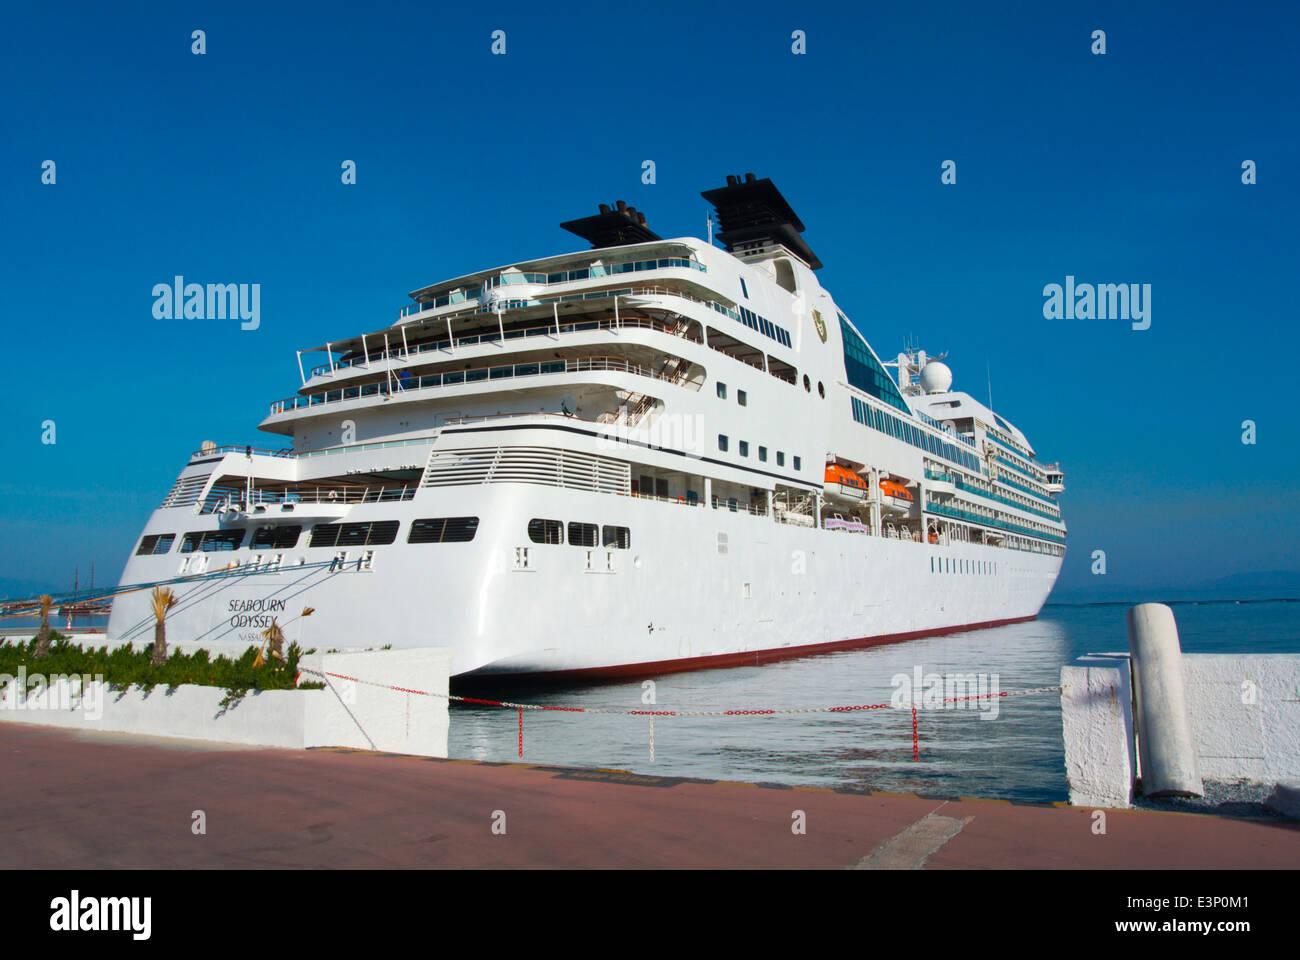 Cruise liner, Port, Kusadasi, Turkey, Asia Minor - Stock Image